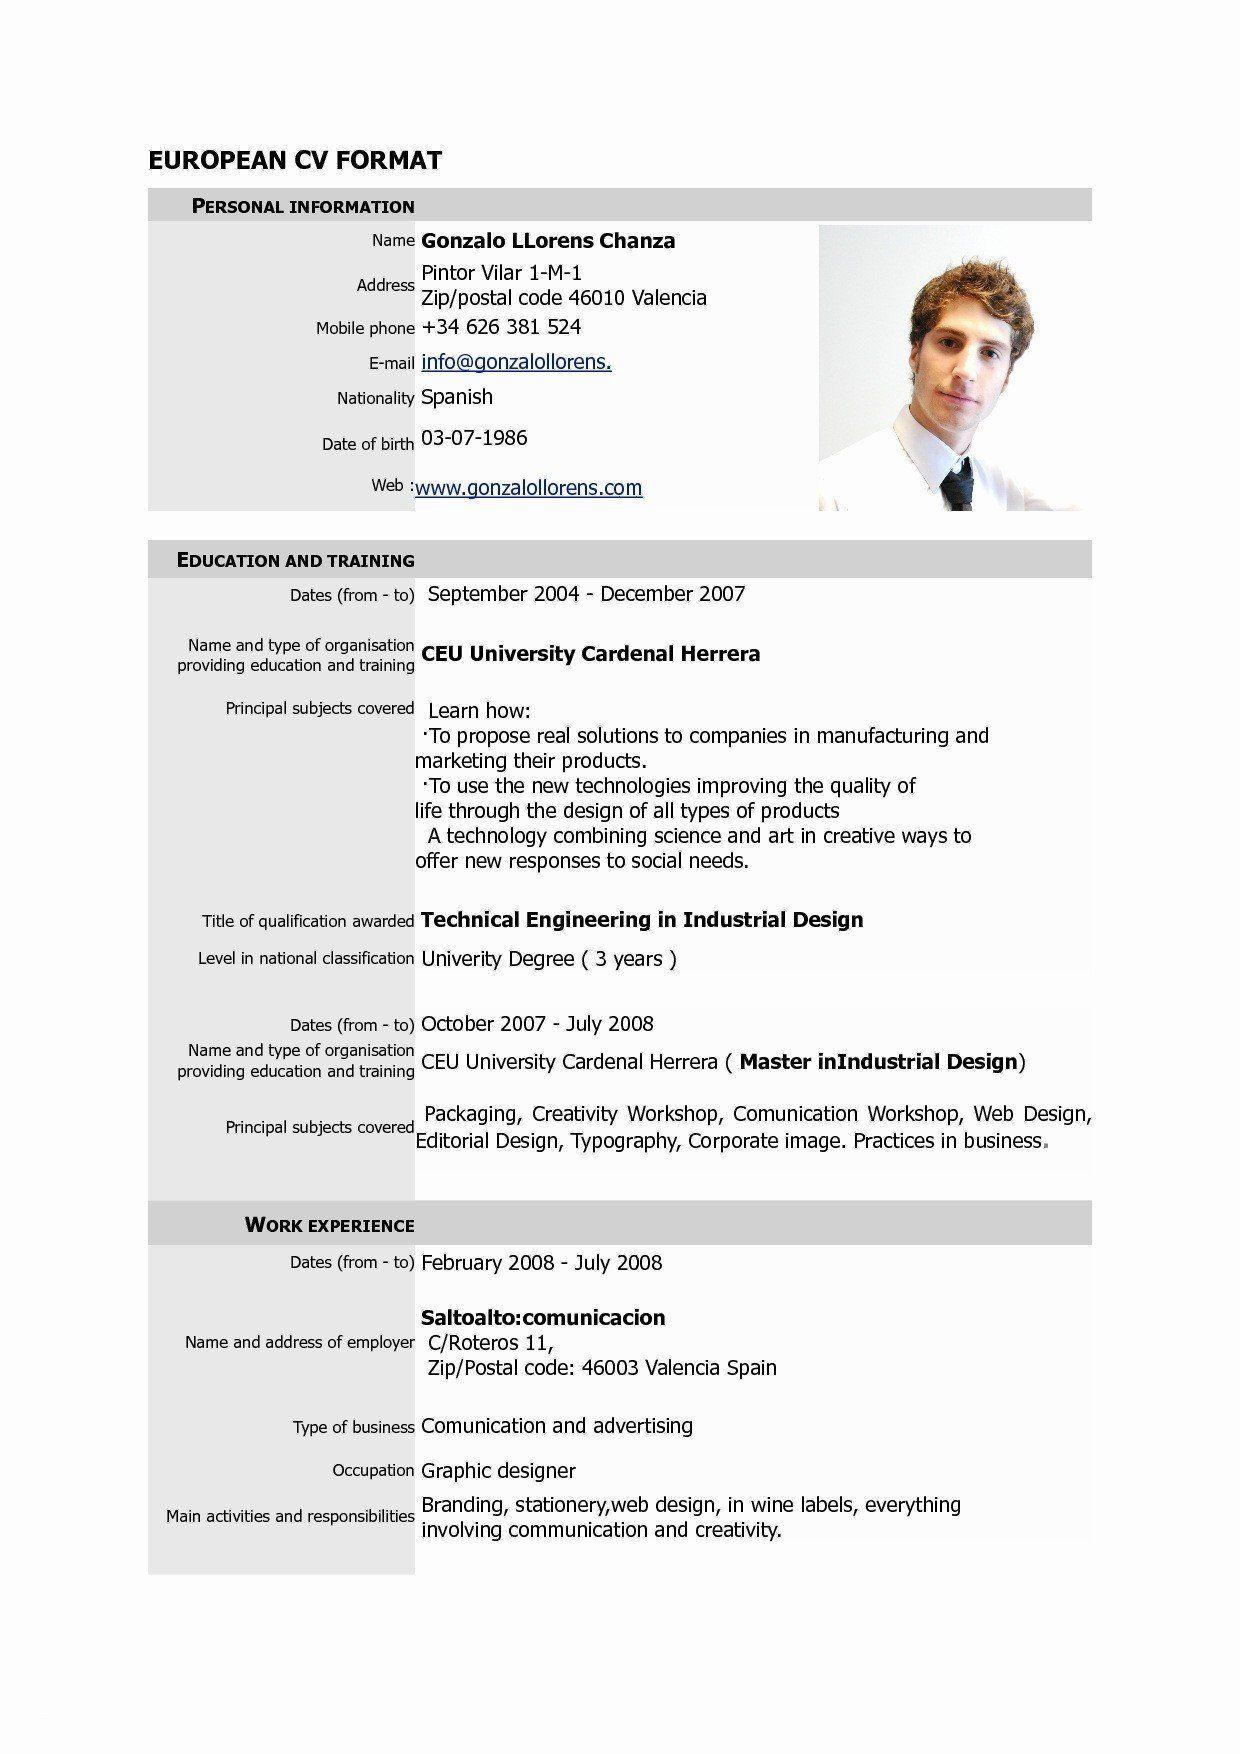 Graphic Designer Resume Template New Professional Graphic Designer Cv Elegant Sample Resume Pdf Cv Format Cv Format For Job Job Resume Format